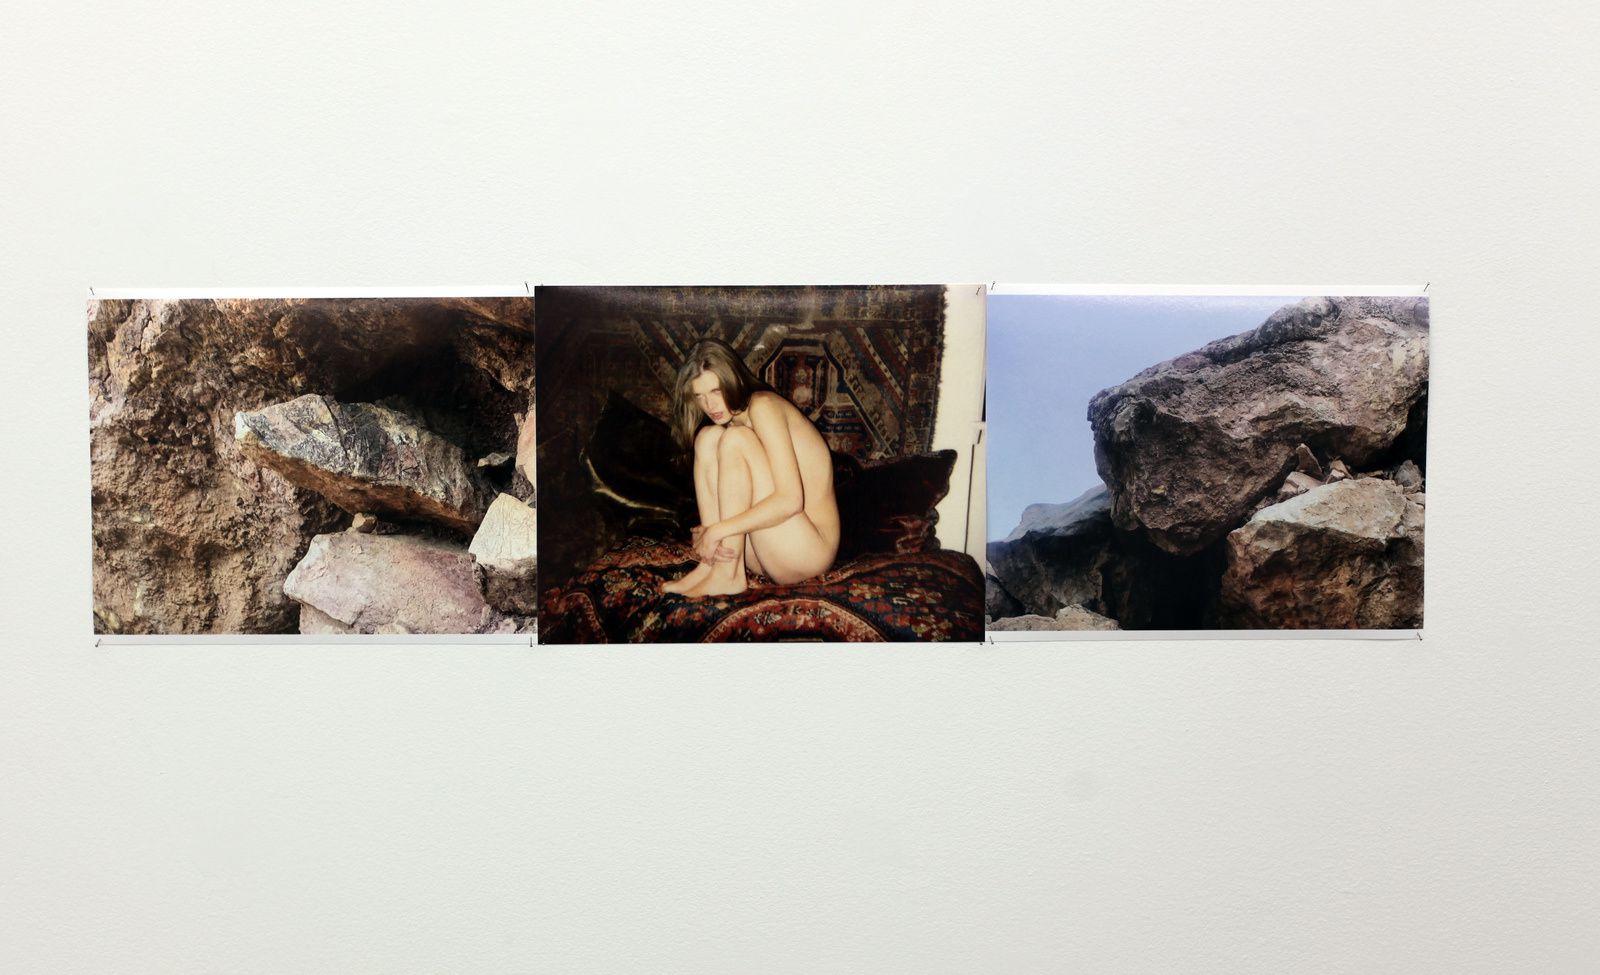 """Oman, Malgosia on Sigmund Freund"", 2008-2016 de Juergen TELLER - Courtesy SUZANNE TARASIEVE © Photo Éric Simon"